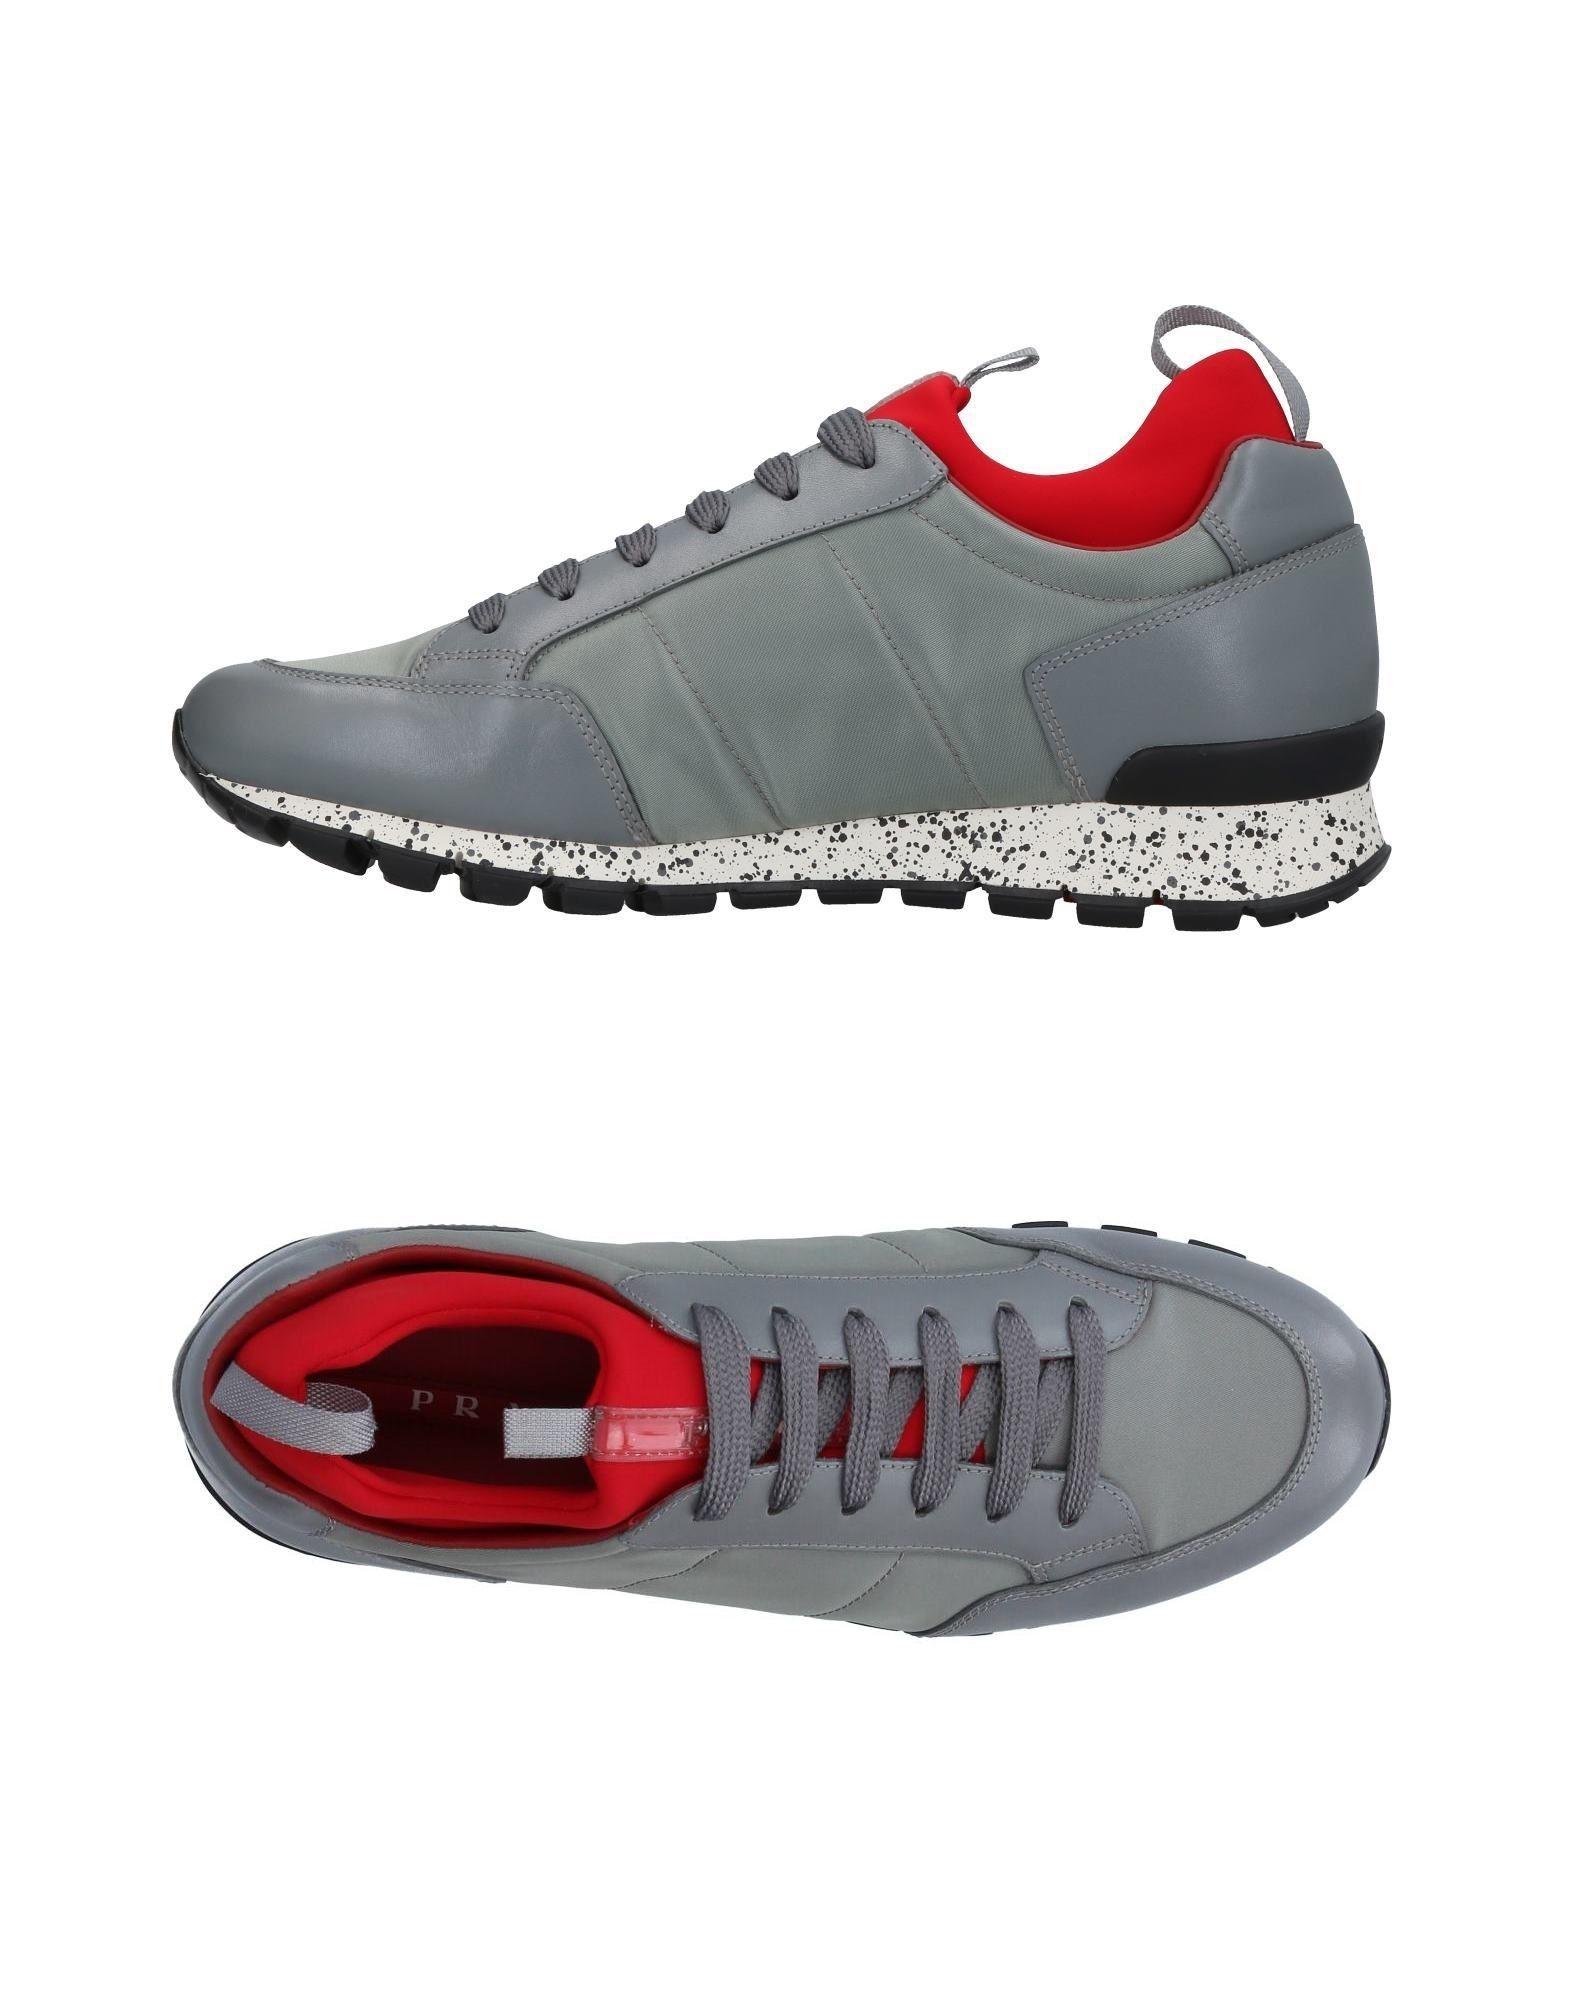 PRADA SPORT Herren Low Sneakers & Tennisschuhe Farbe Grau Größe 11